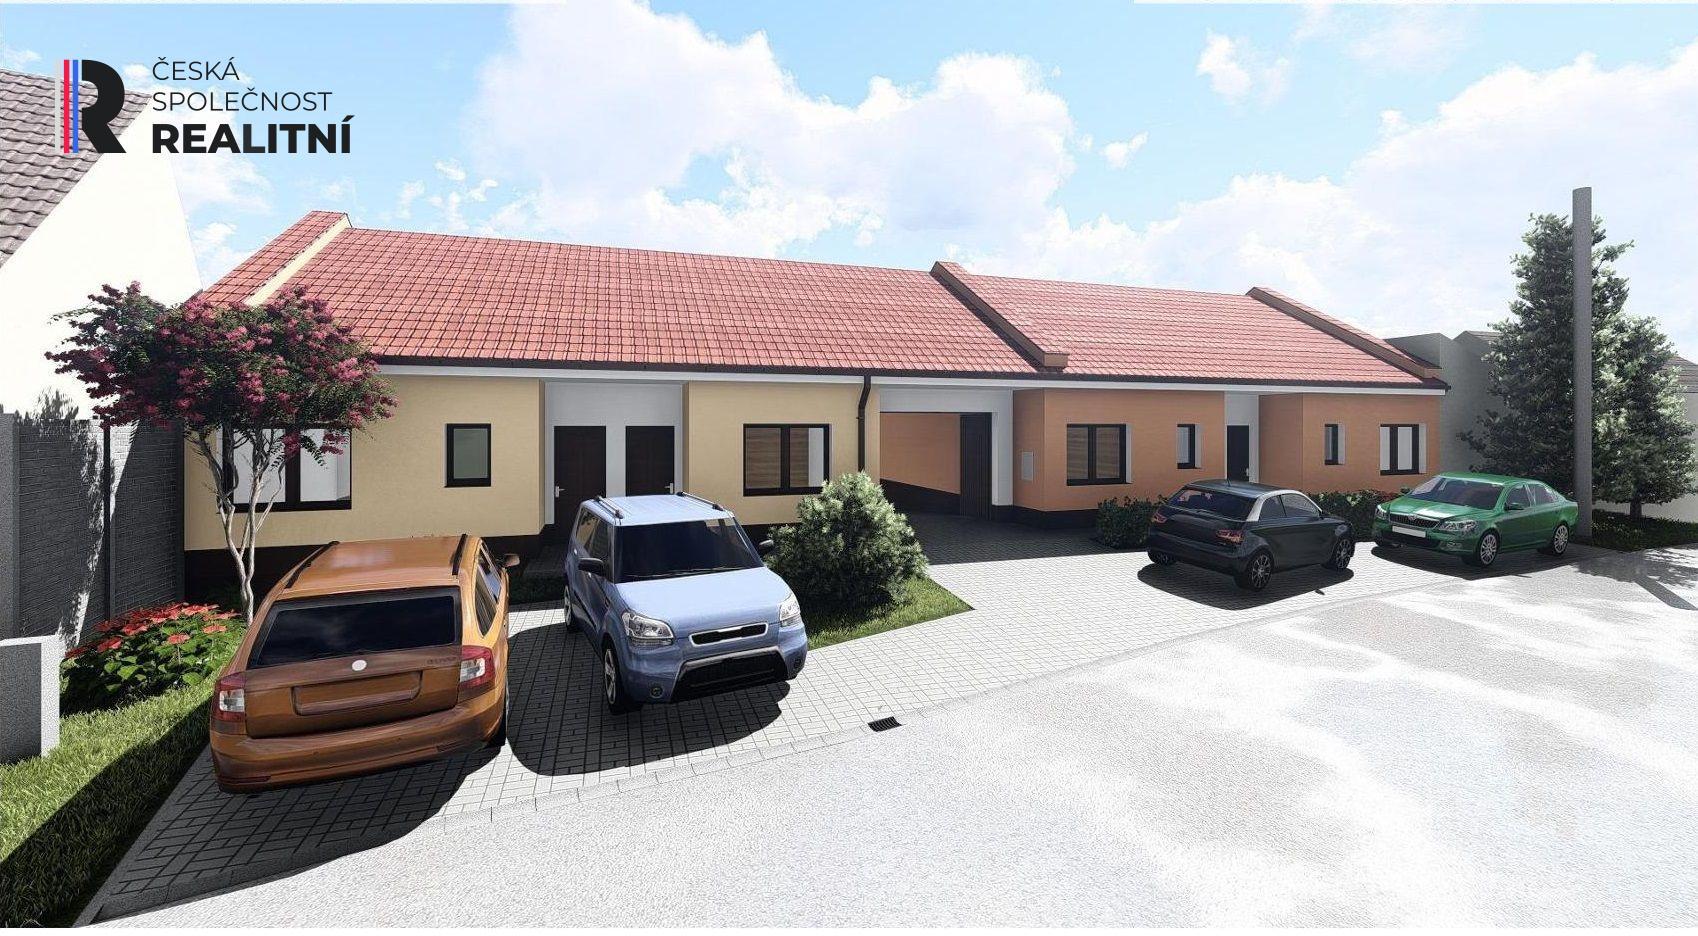 Rodinný dům - Penzion Strachotín